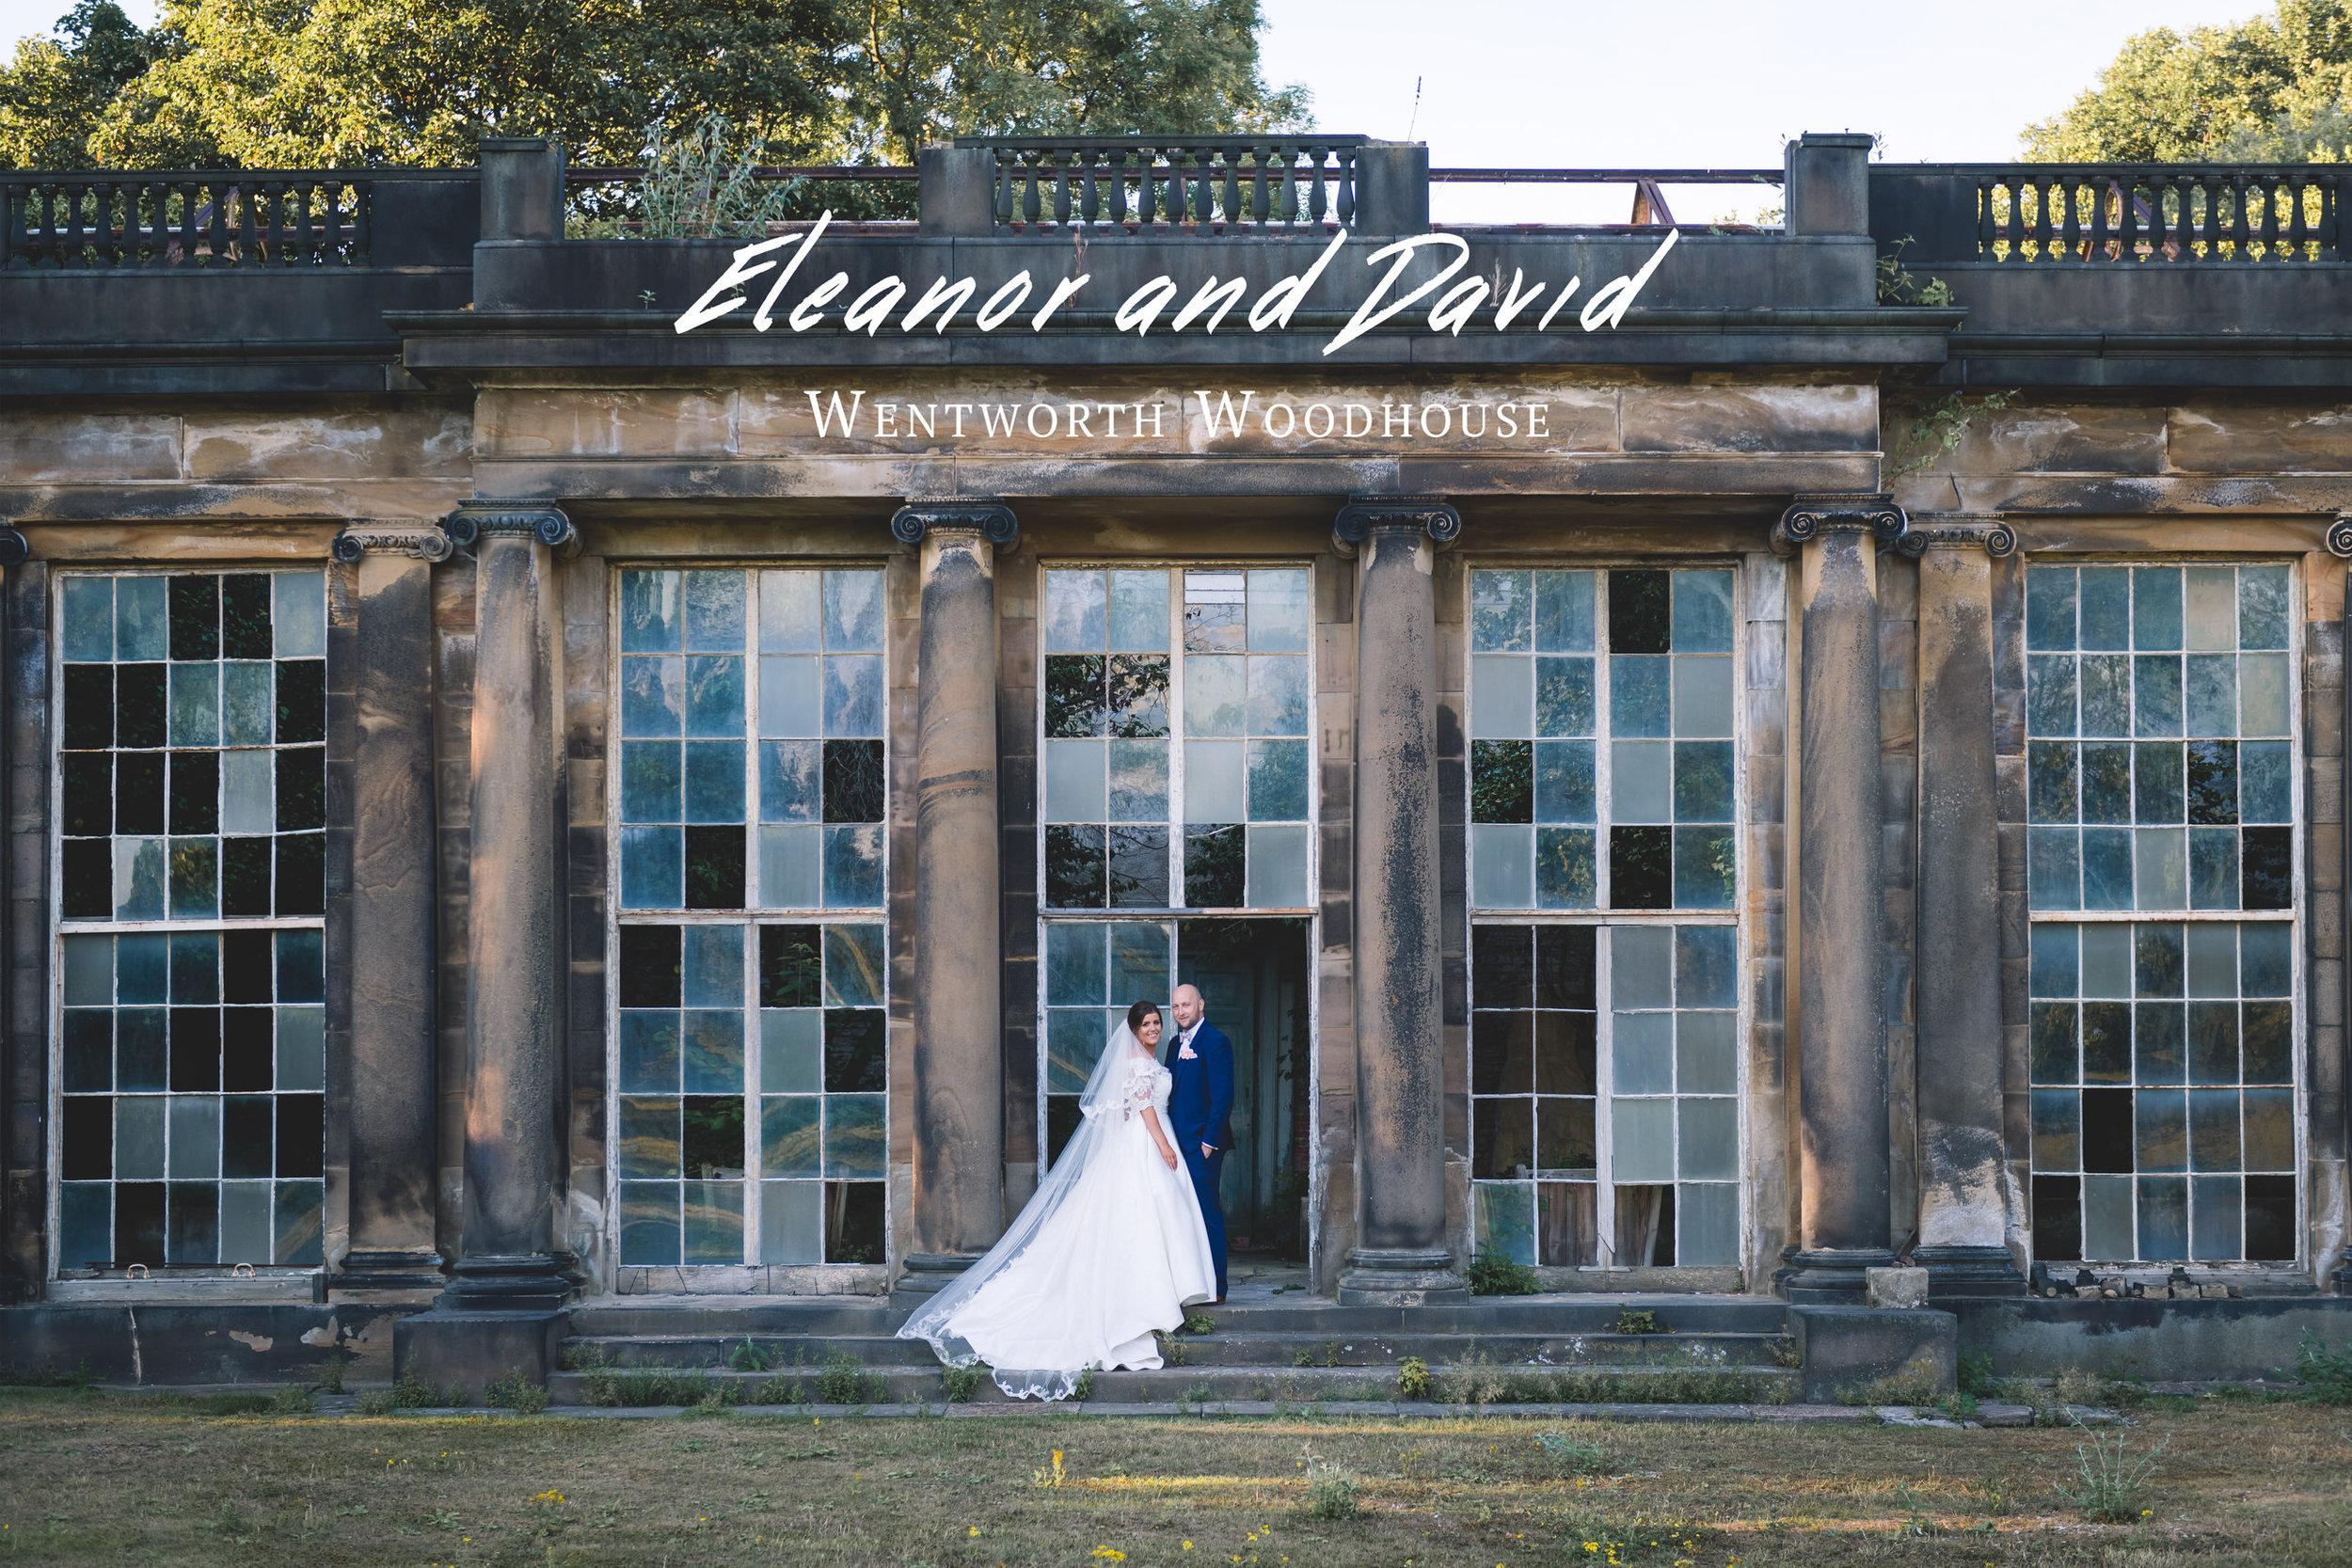 Wentworth-Woodhouse-Yorkshire-Wedding-photographer.jpg